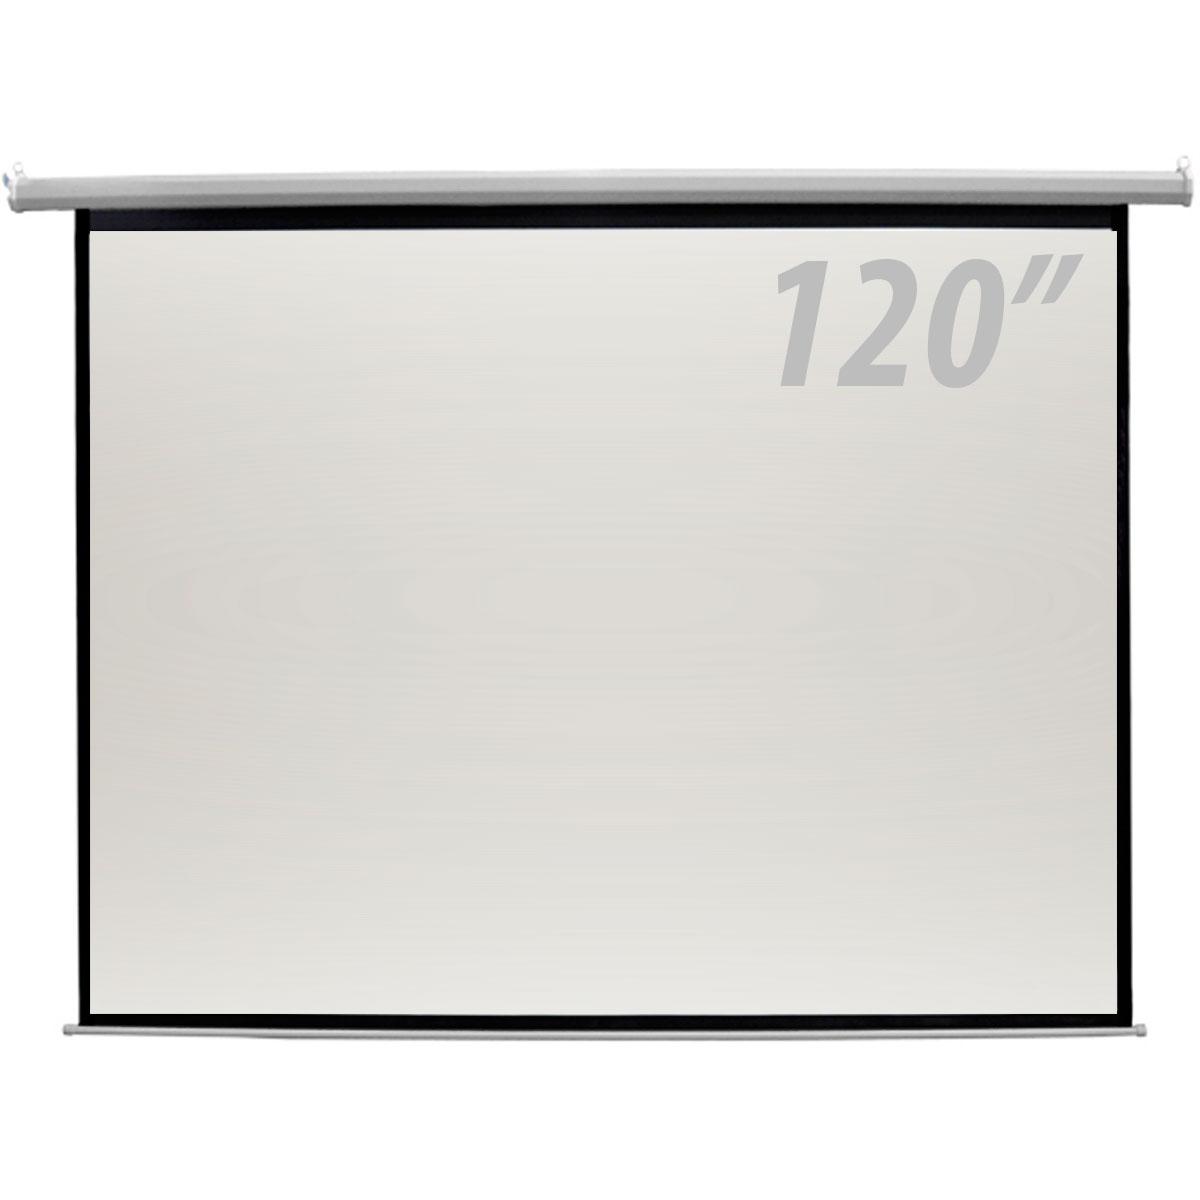 120 - Tela de Proje��o 120 Polegadas El�trica c/ Controle Remoto - CSR